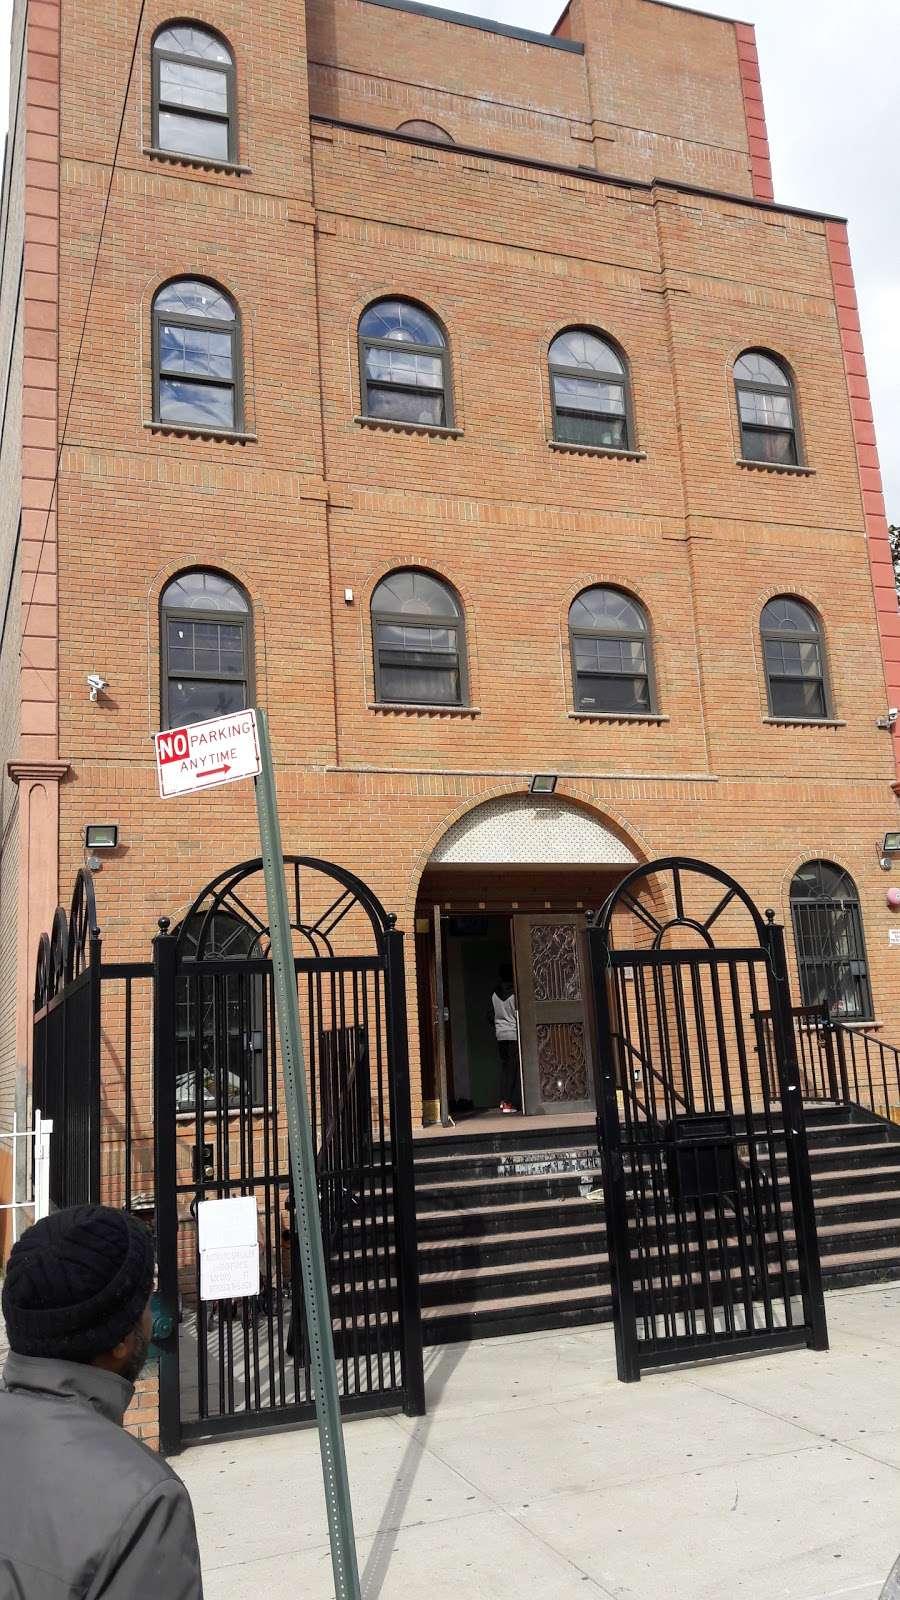 Baitul Mamur Masjid & Community Center - mosque  | Photo 8 of 10 | Address: 1033 Glenmore Ave, Brooklyn, NY 11208, USA | Phone: (718) 437-5702